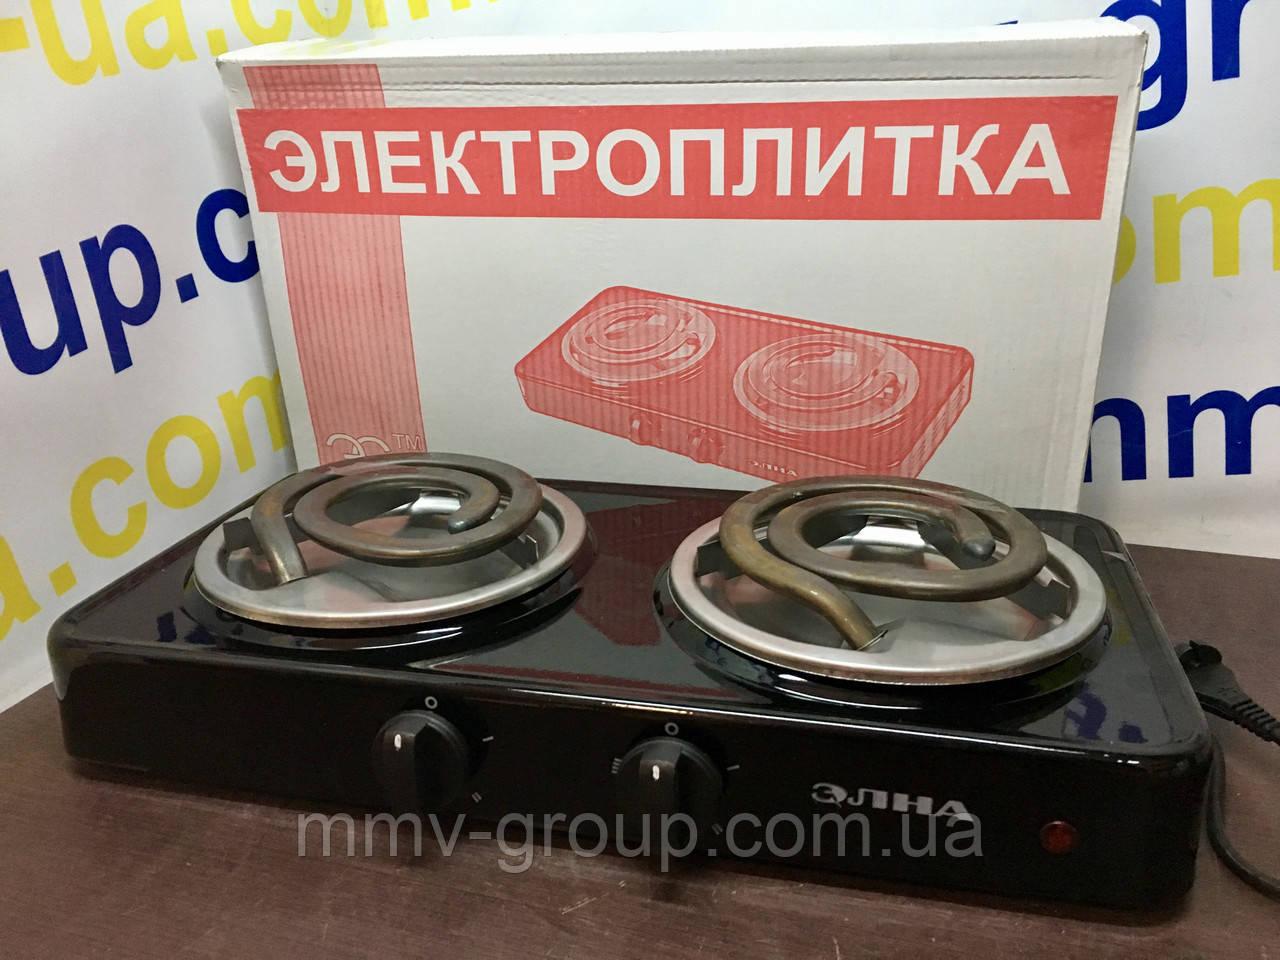 Плиты электрические  ЭЛНА-020Н